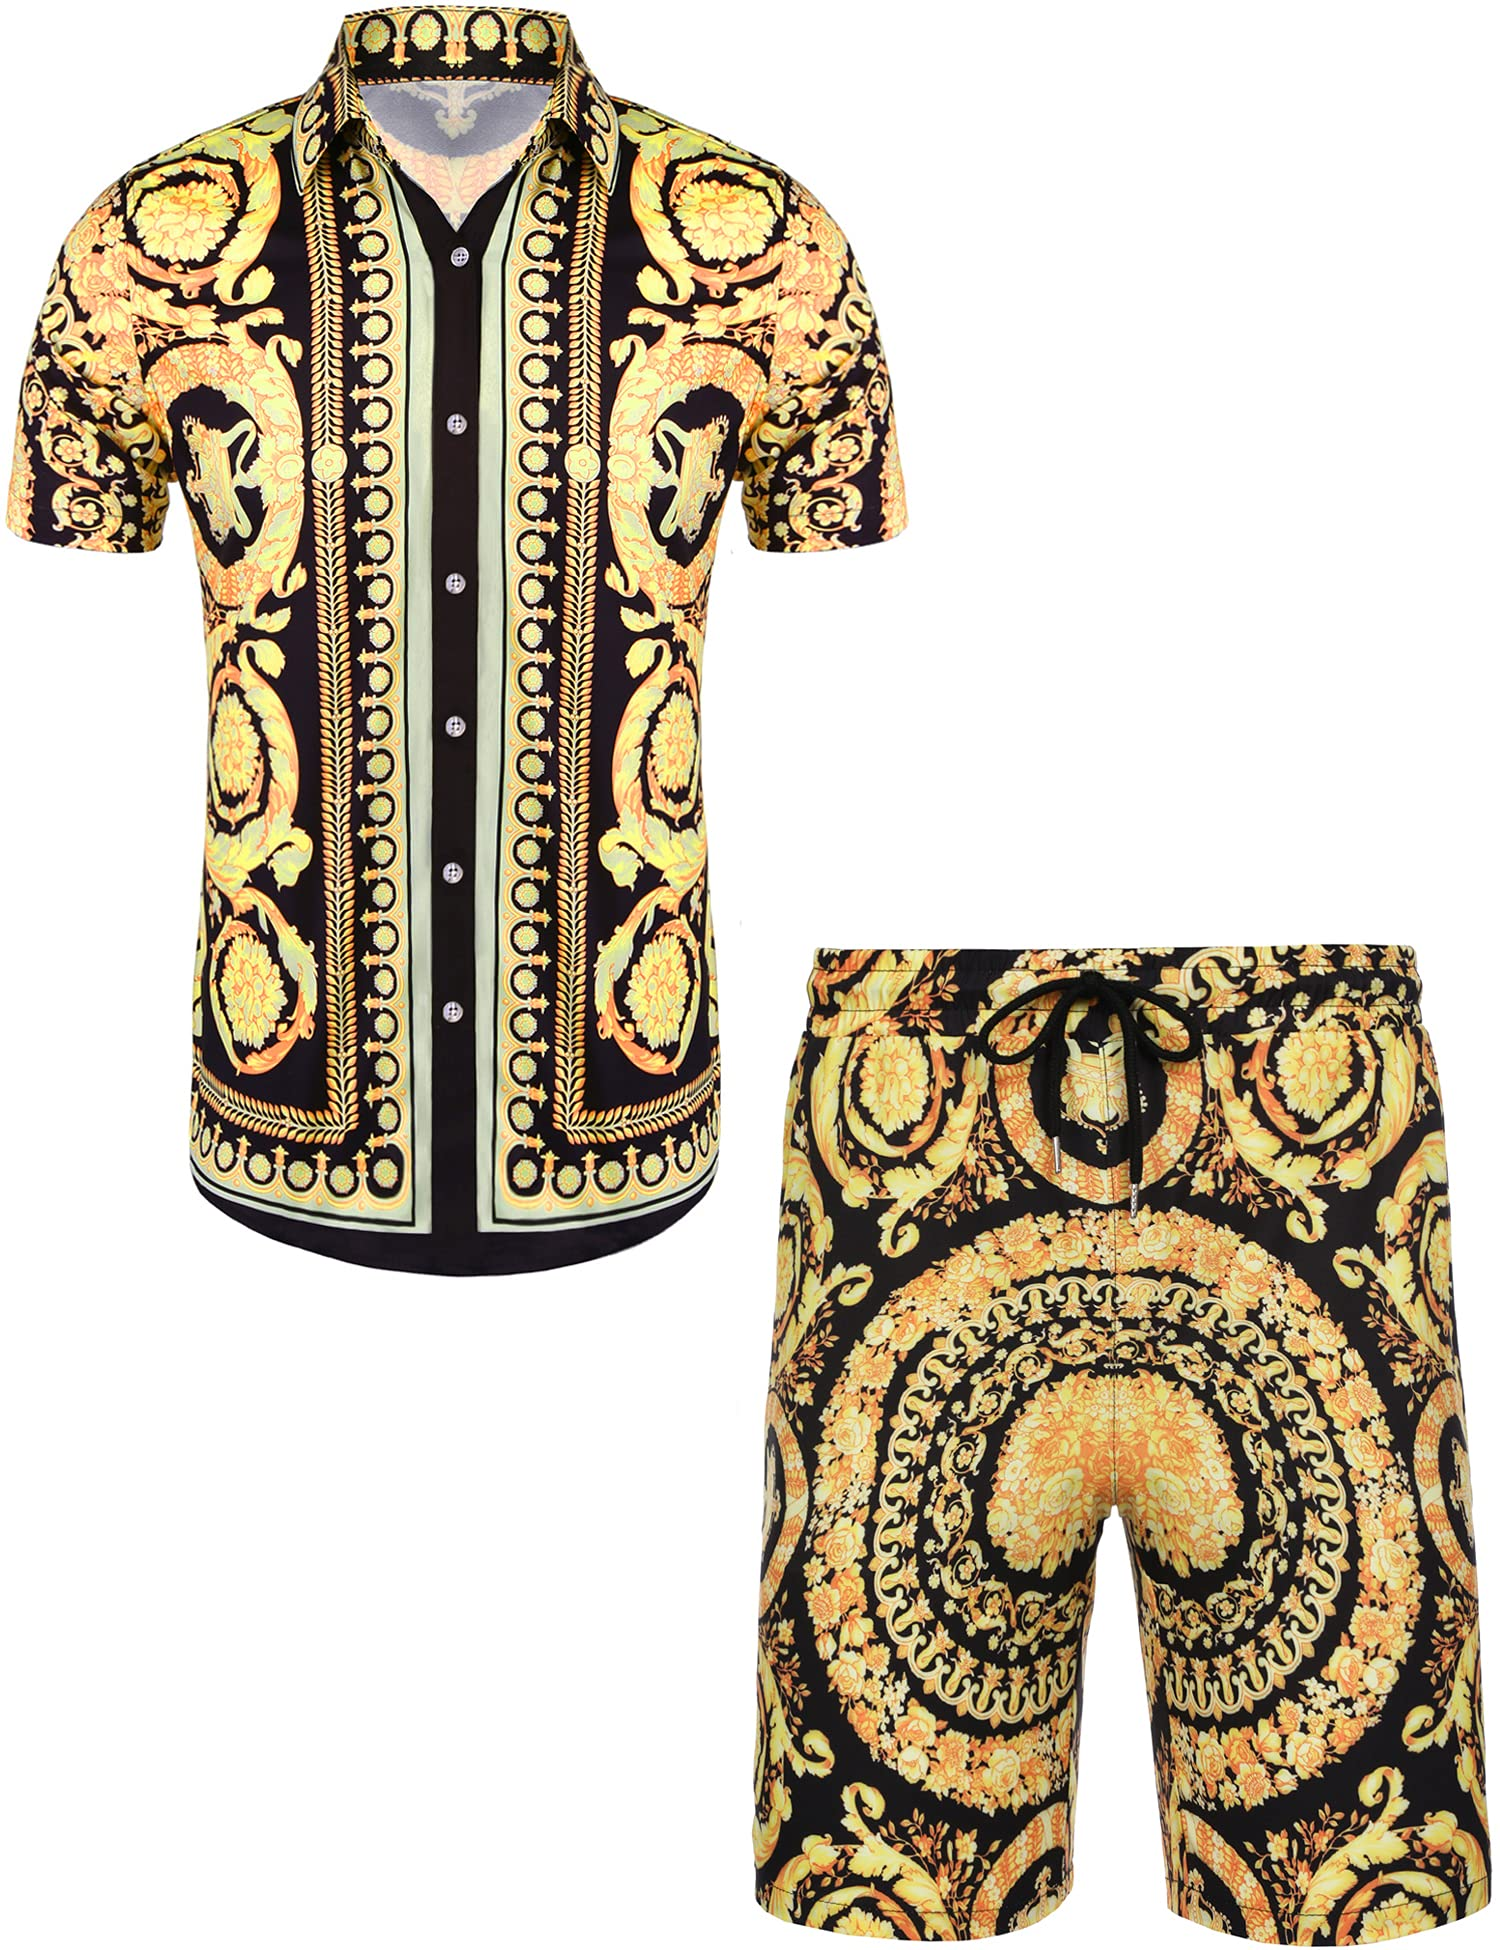 Daupanzees Men's Luxury Casual Button Down Short Sleeve Hawaiian Shirt Suits